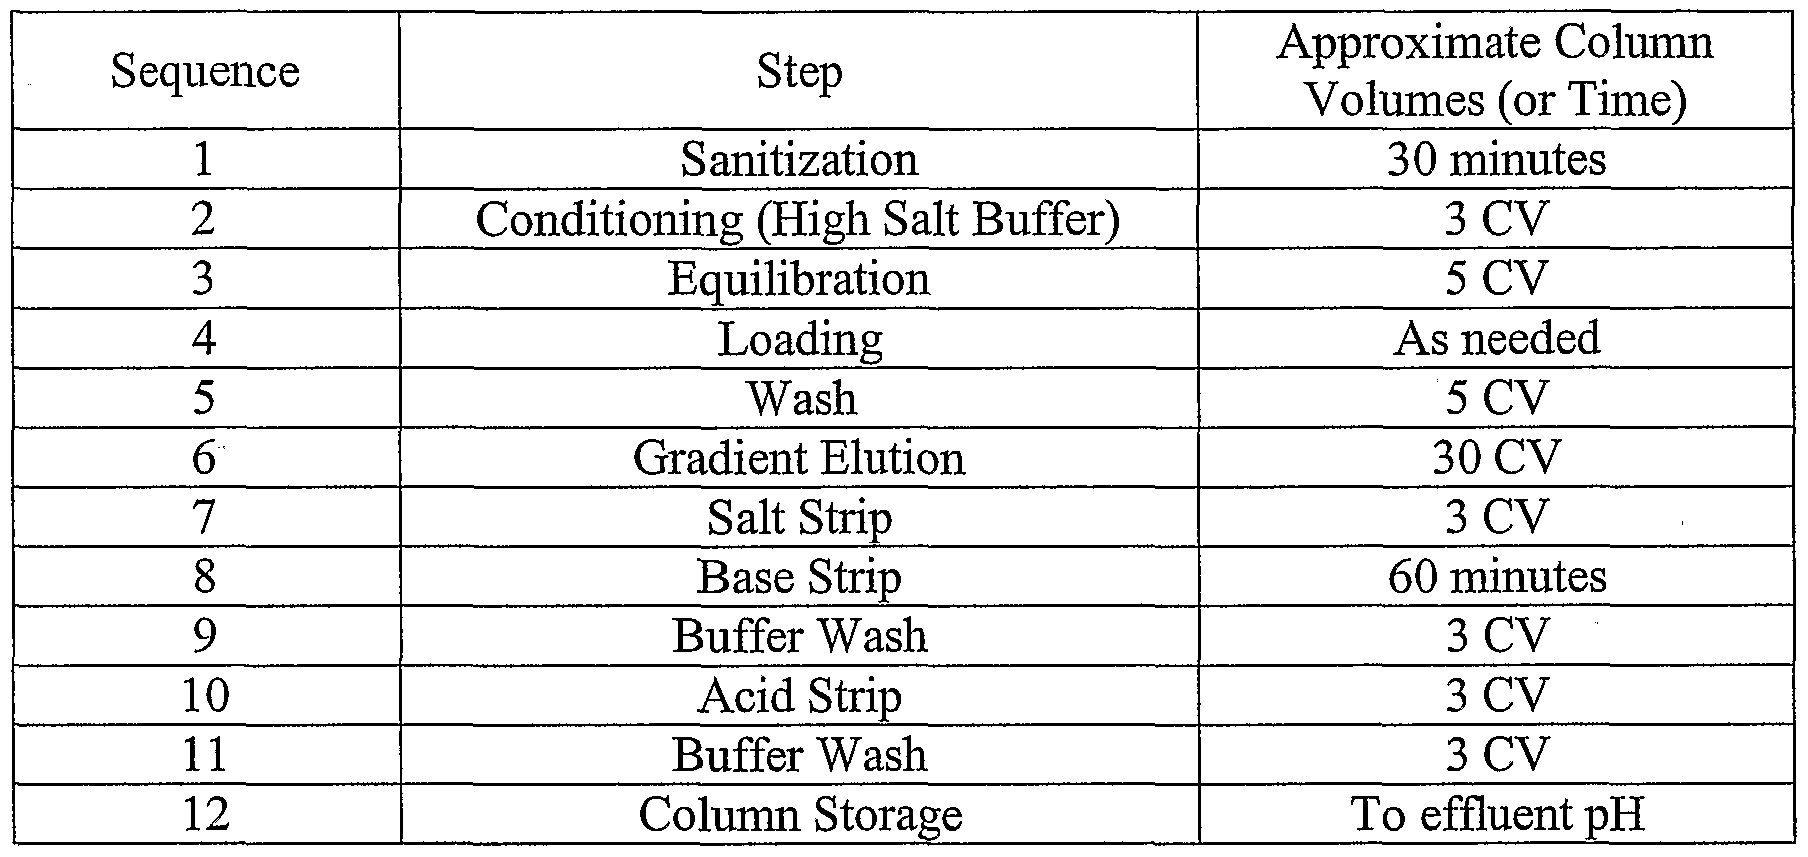 WO2004020971A2 - Chromatographic methods for adenovirus purification